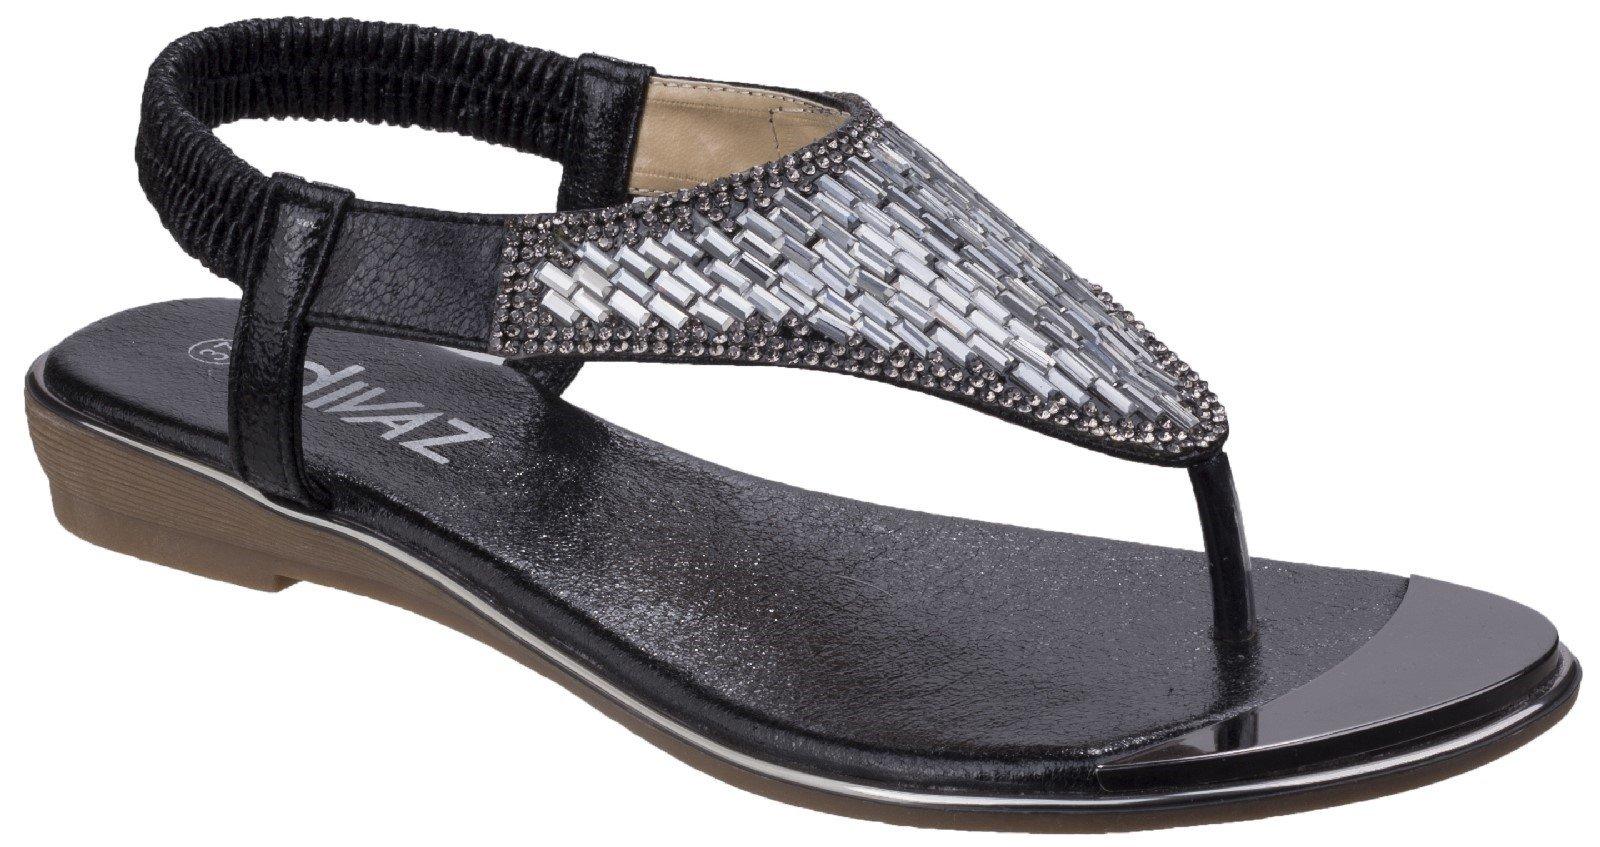 Divaz Women's Kirsty Toe Post Sandal Various Colours 26331 - Black 3